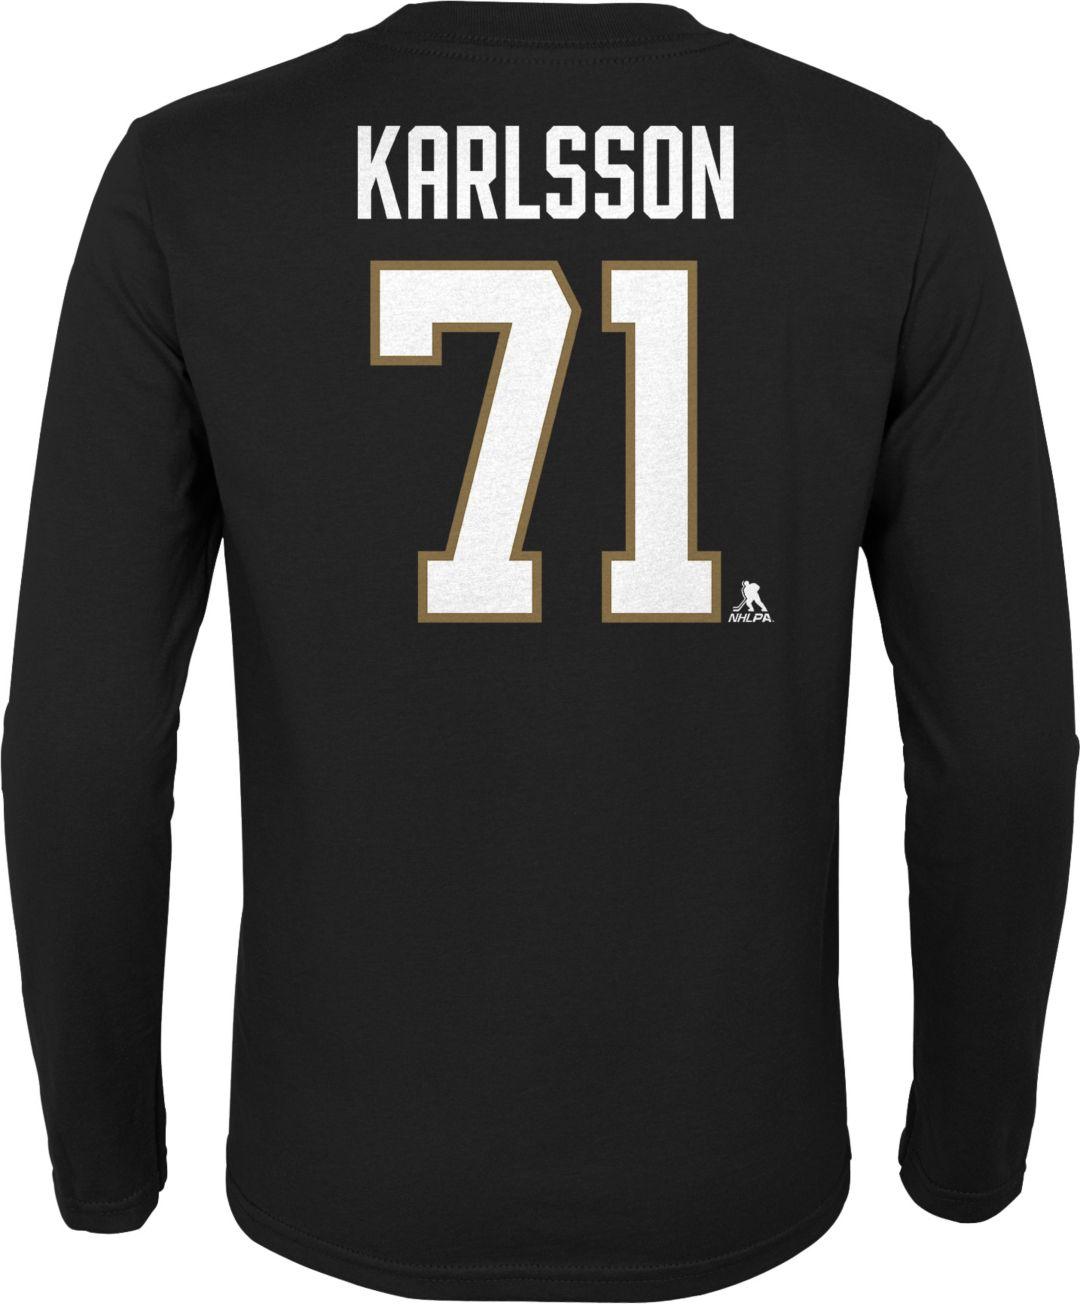 sale retailer 37687 2ec1c NHL Youth Vegas Golden Knights William Karlsson #71 Black Long Sleeve  Player Shirt